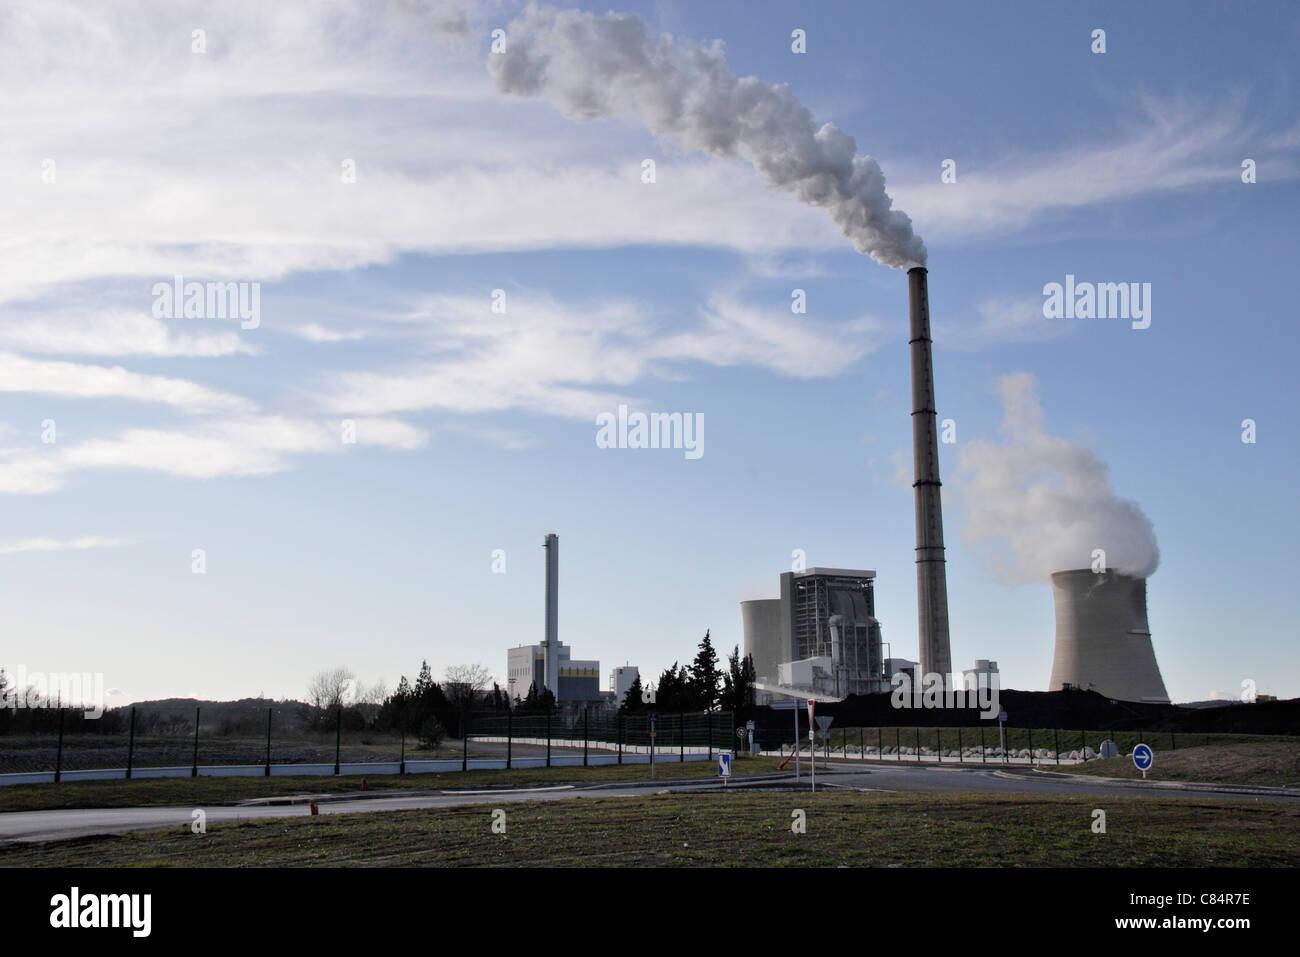 Factory, smoke coming out of smokestacks - Stock Image